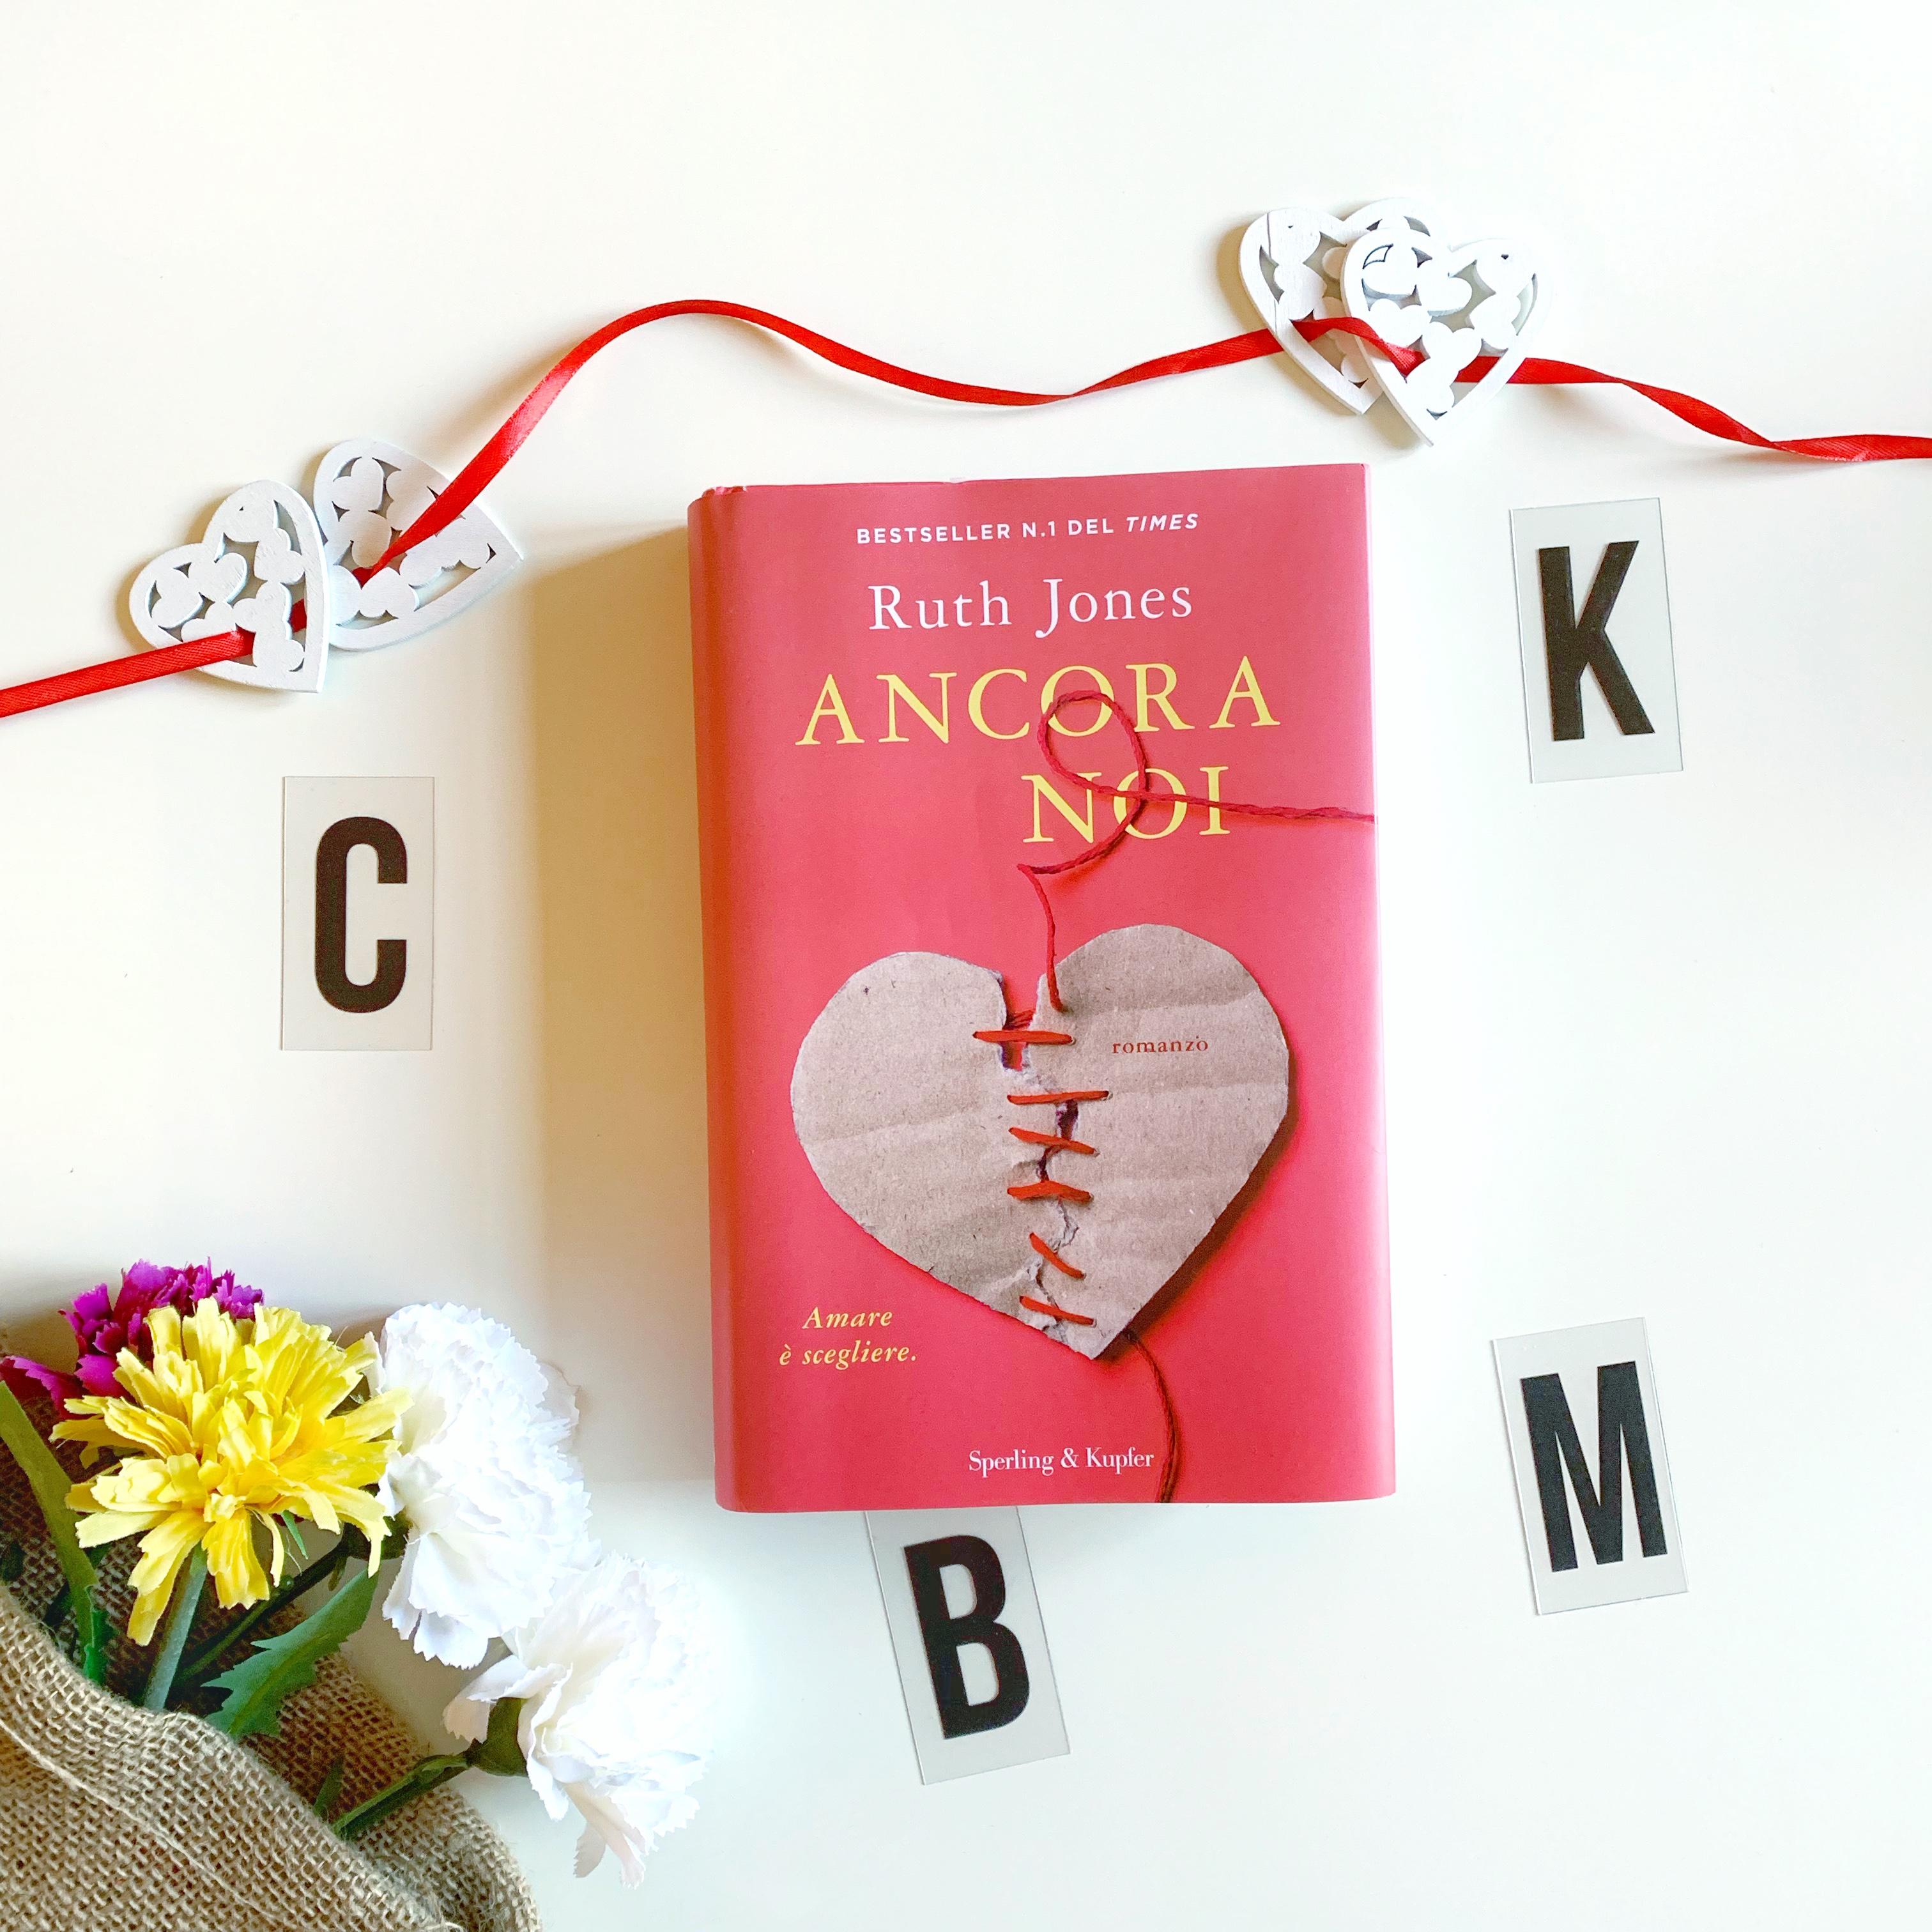 Ancora noi Ruth Jones Romance Storia d'amore San Valentino Sperling & Kupfer